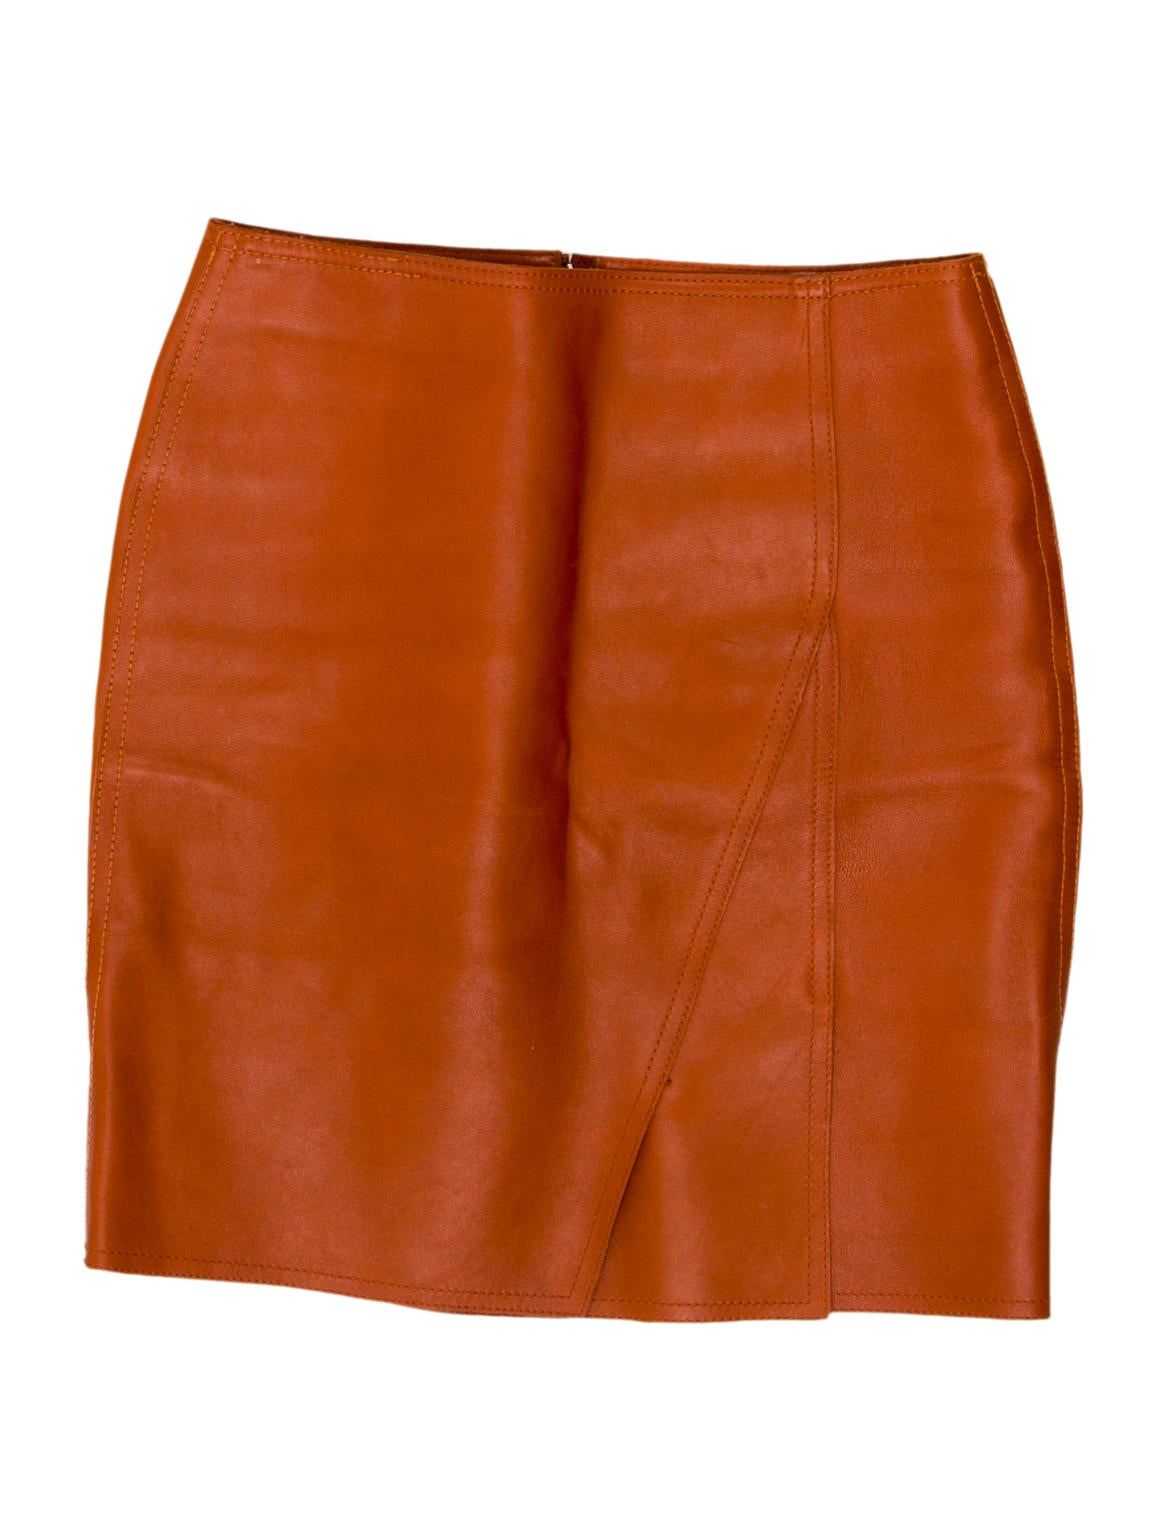 3 1 phillip lim leather skirt clothing w31ph26573